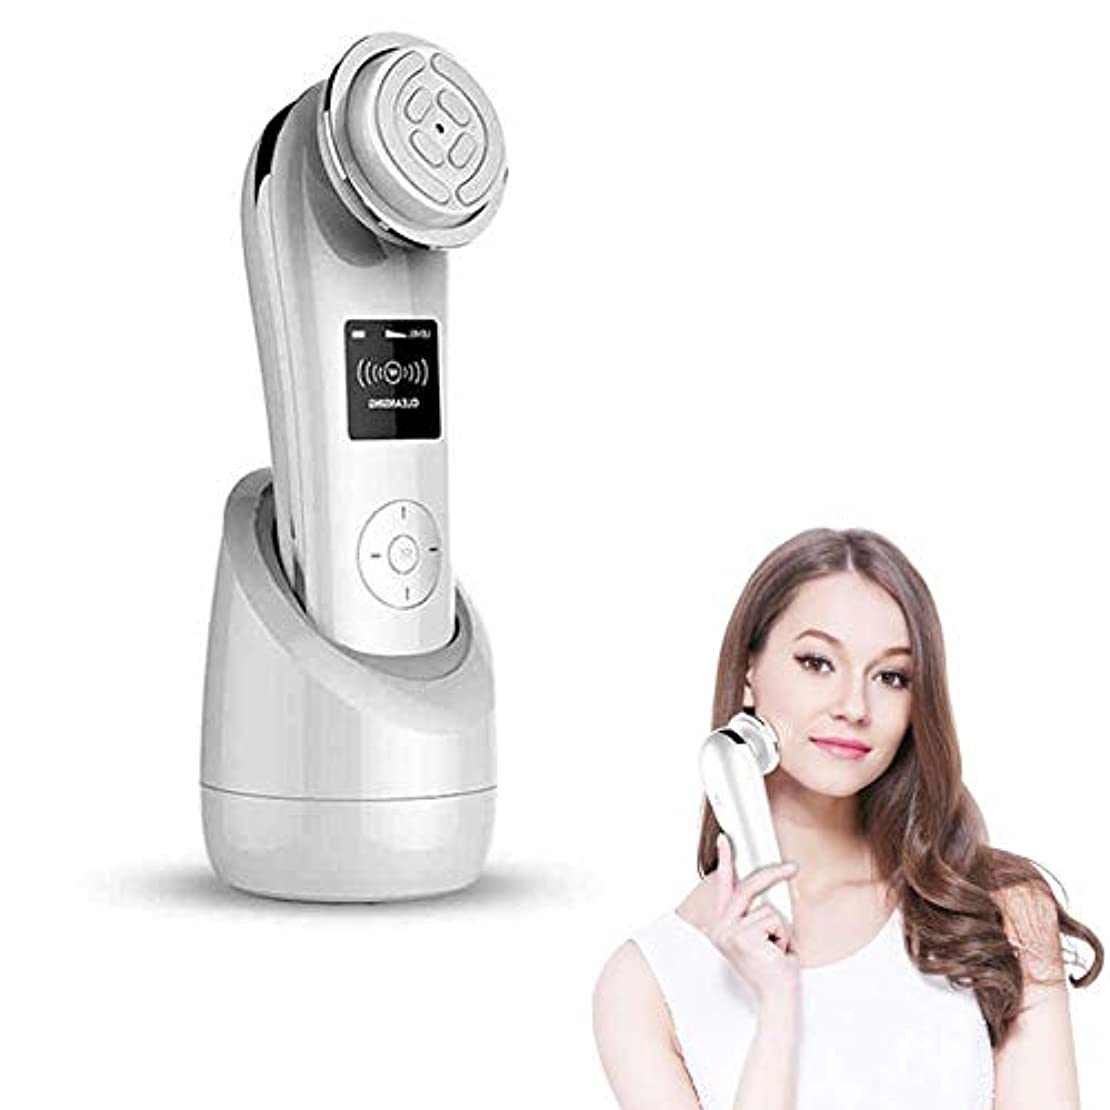 RFスキンリジェネレイティングホワイトニングフェイシャルマッサージャー美容機EMSシワ除去リフトファーミングフェイシャルスキンケア美容機器フェイシャルマッサージャー